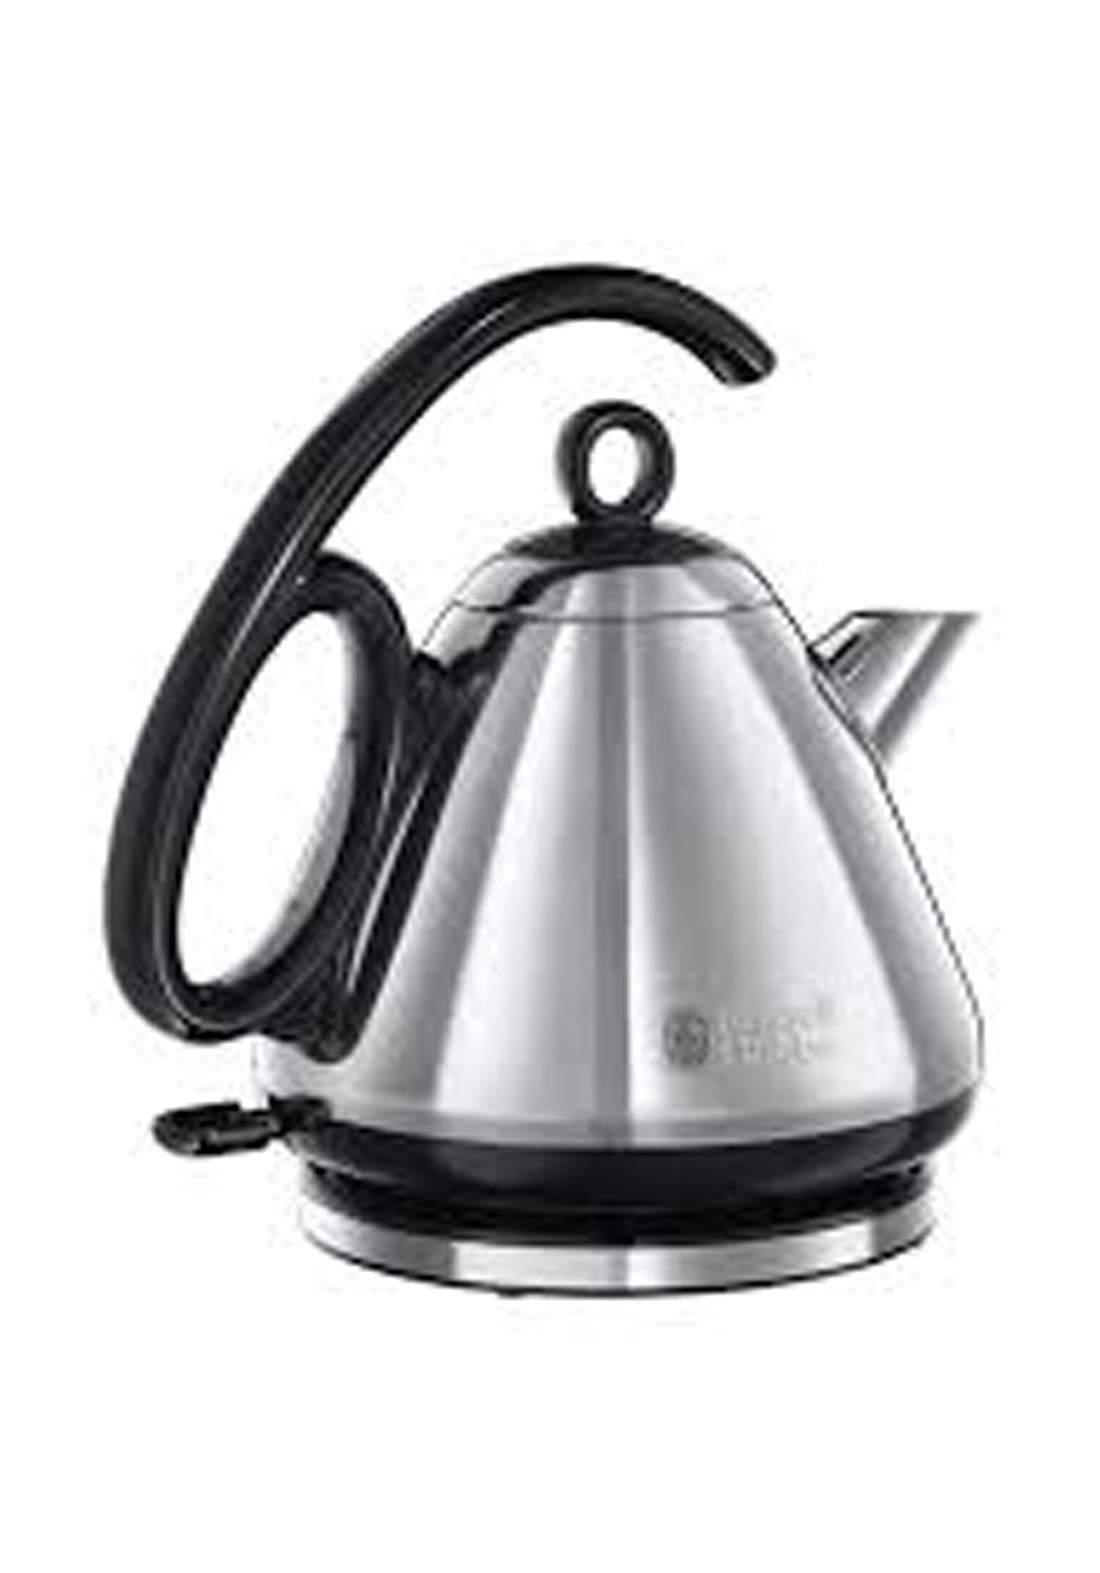 Russell hobbs 21280 Electrical kettle  غلاية